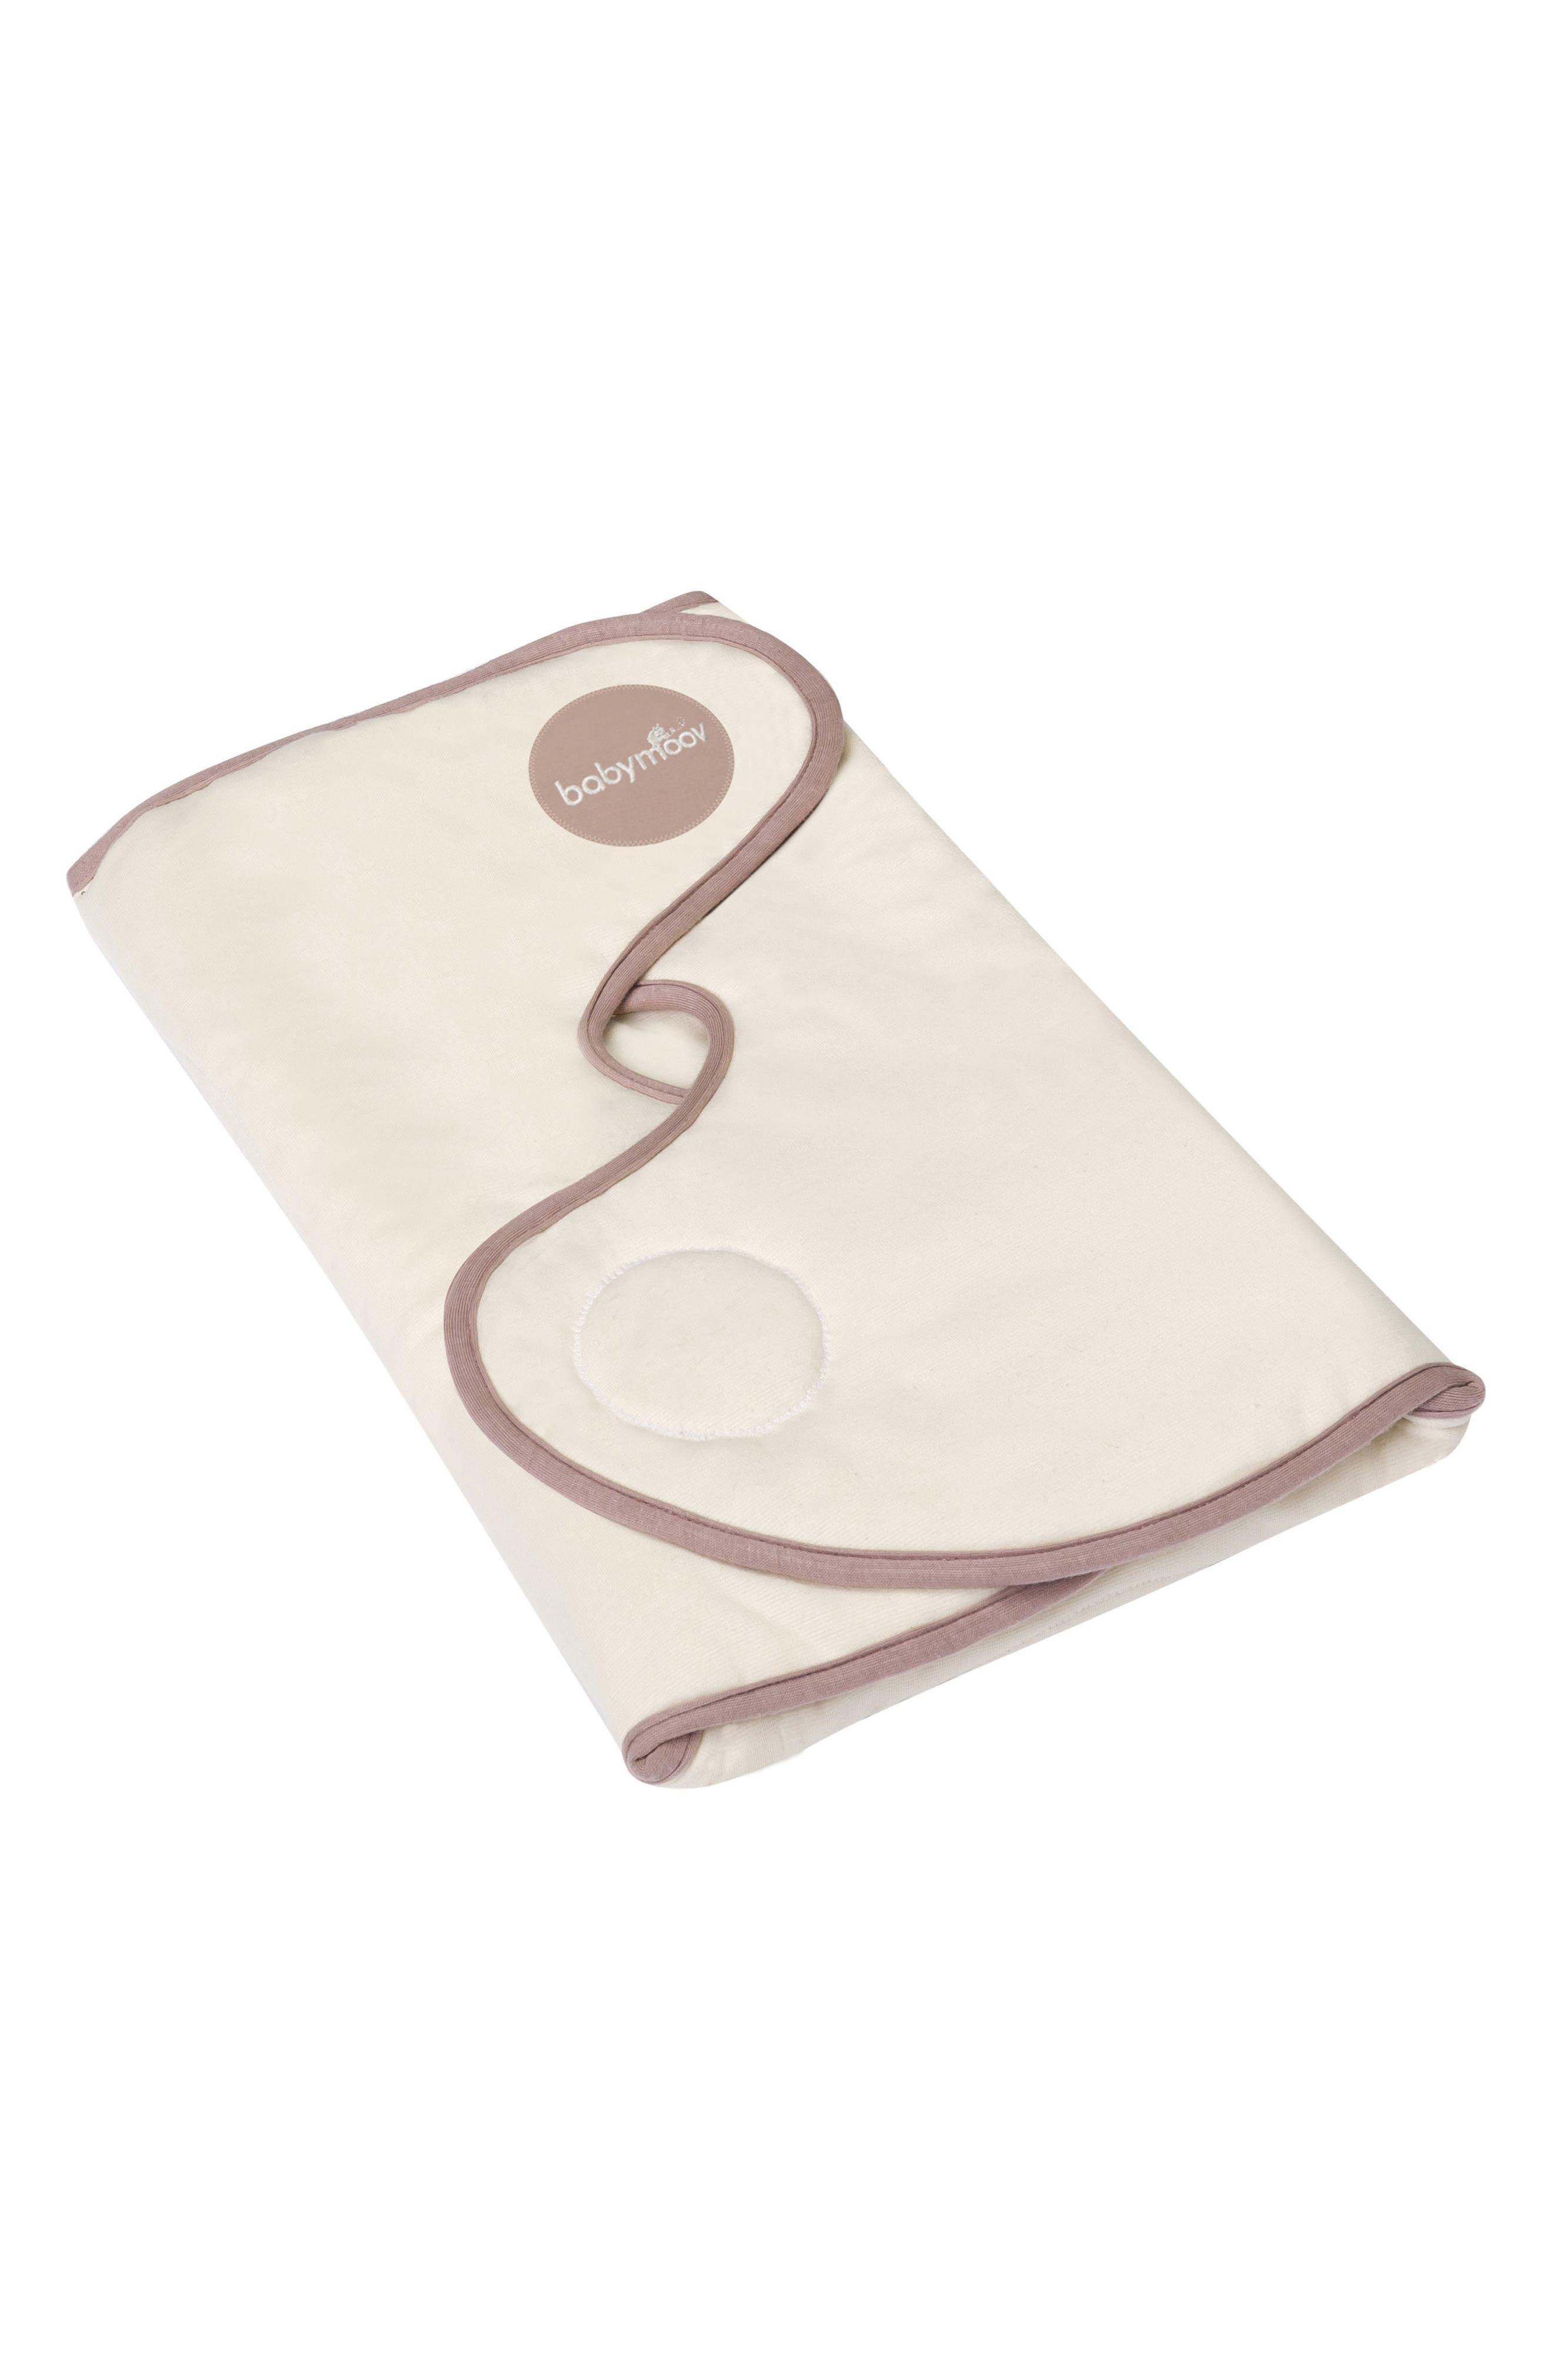 Babymoov CozyCover Swaddle Wrap Blanket